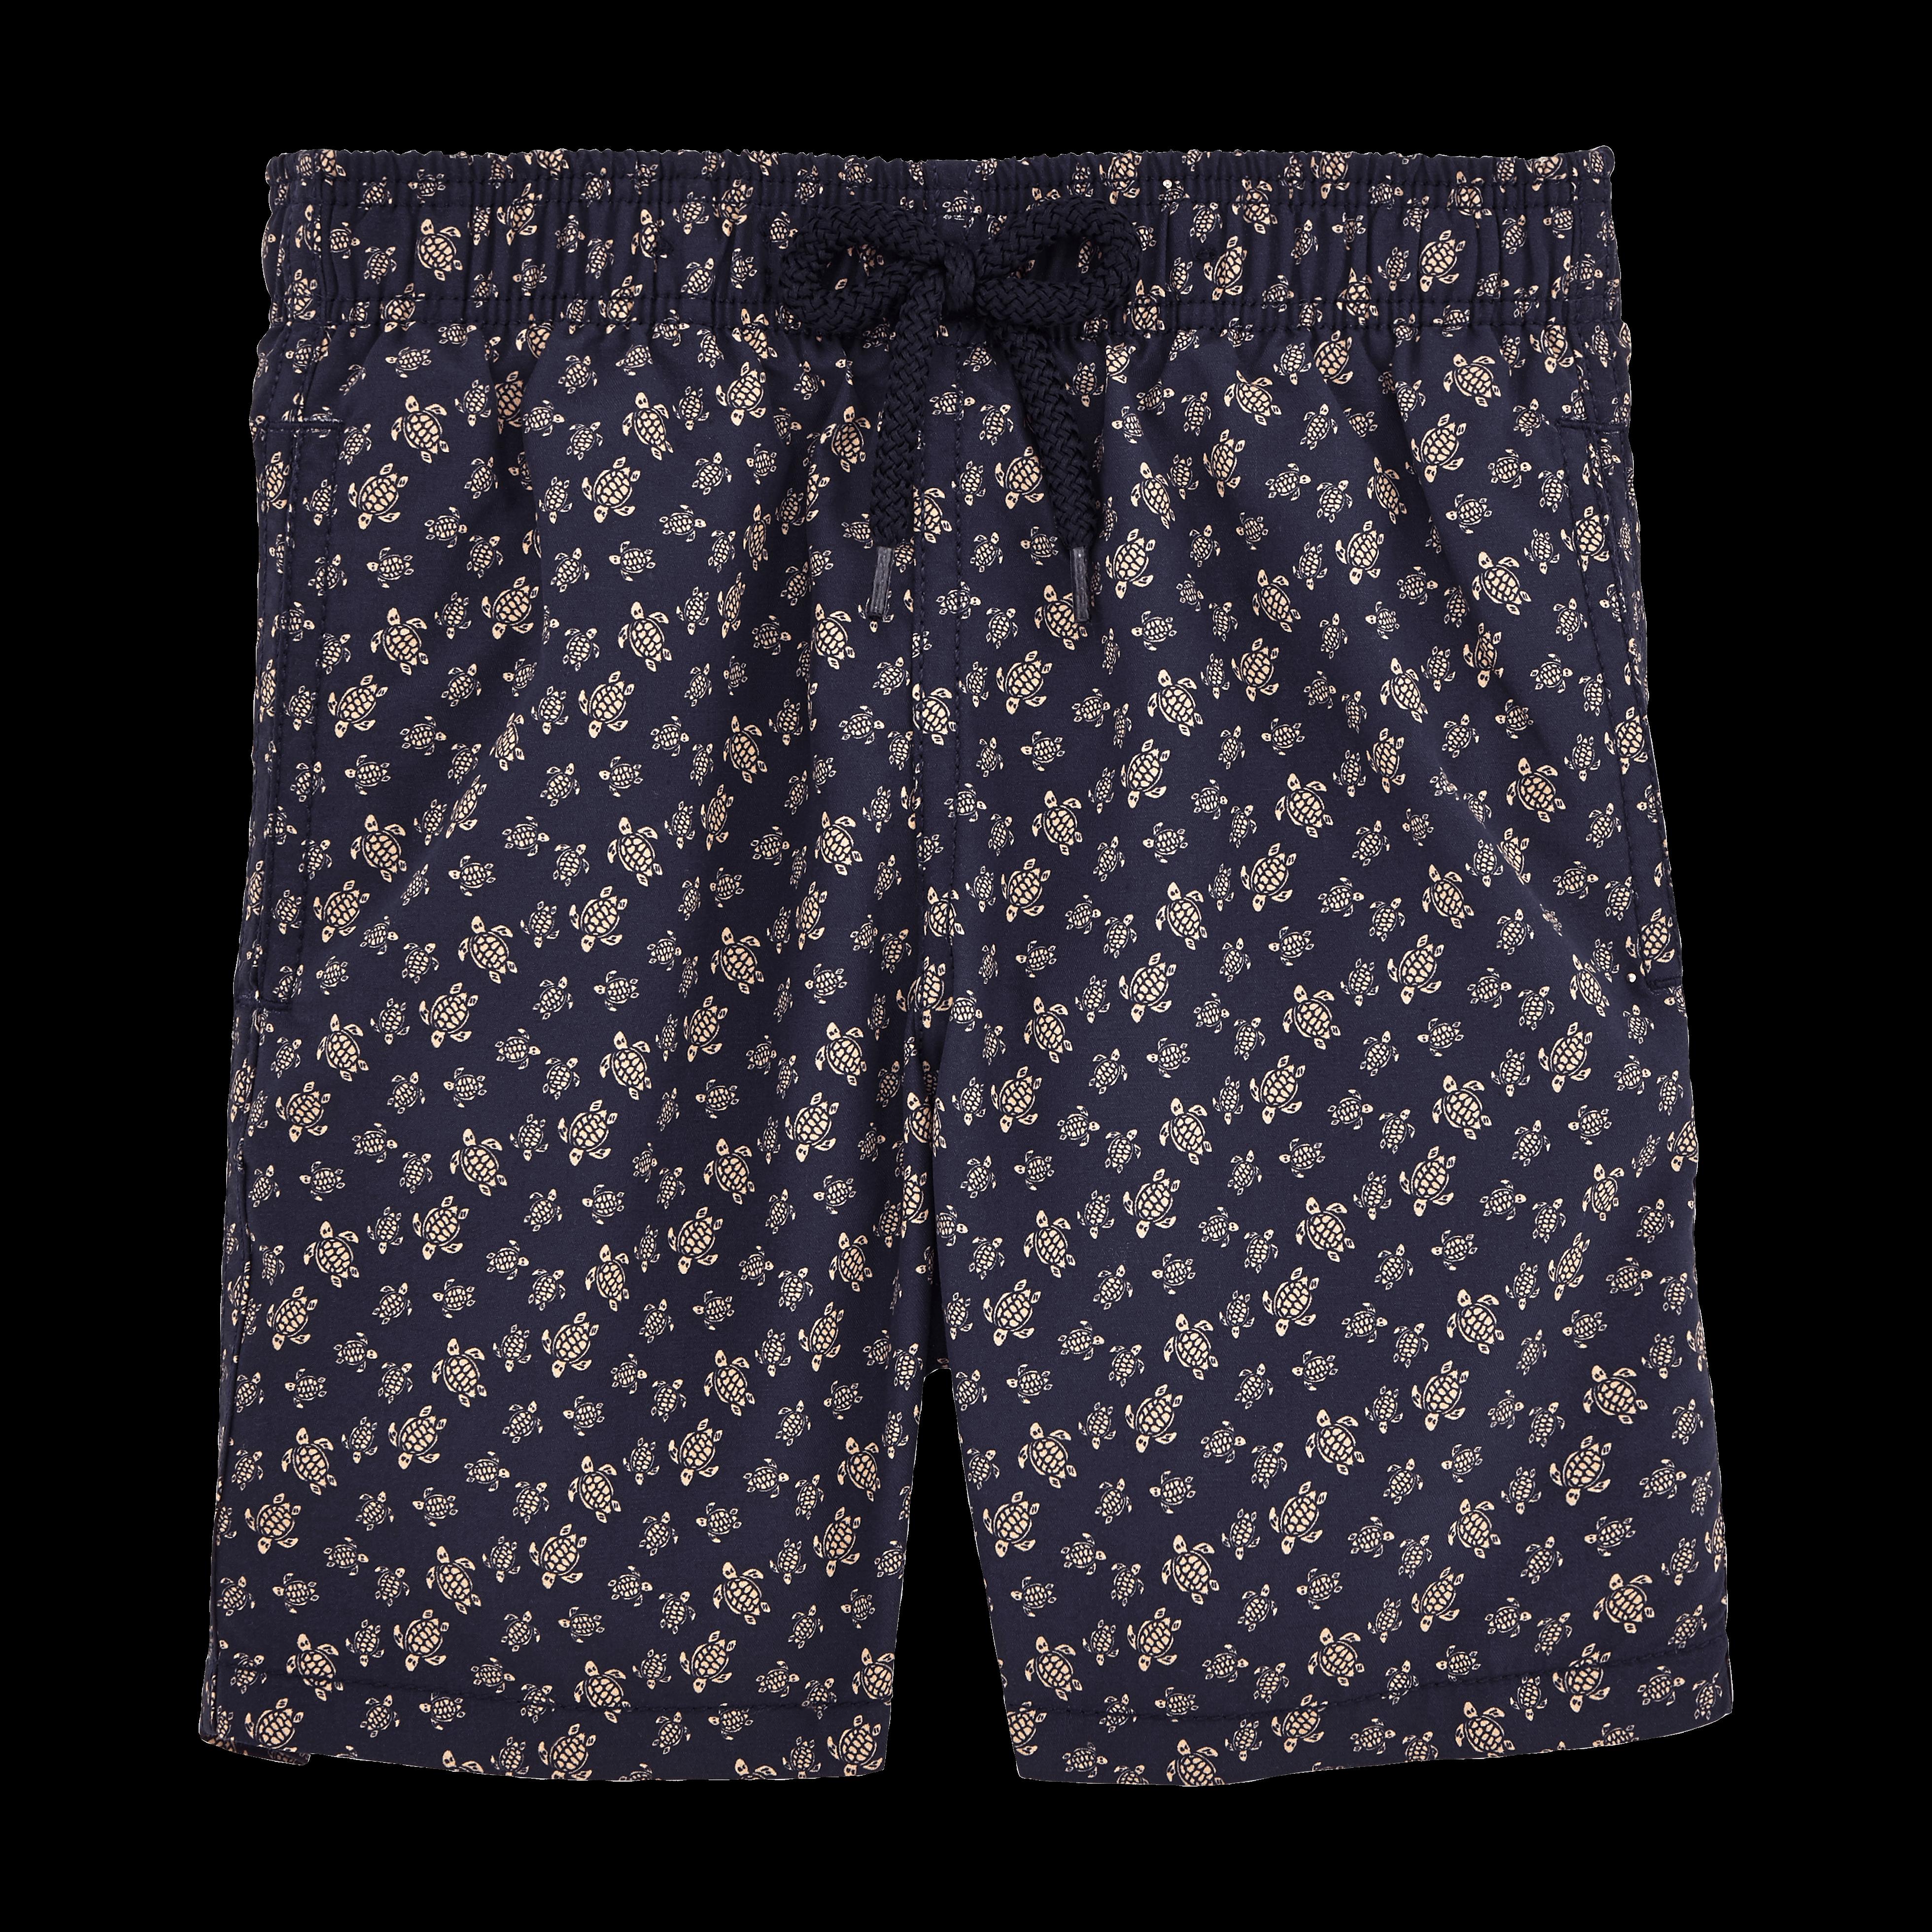 VILEBREQUIN | Boys Swimwear - Micro Ronde des Tortues Swim Shorts - SWIMMING TRUNK - JAM - Blue - 14 - Vilebrequin | Goxip